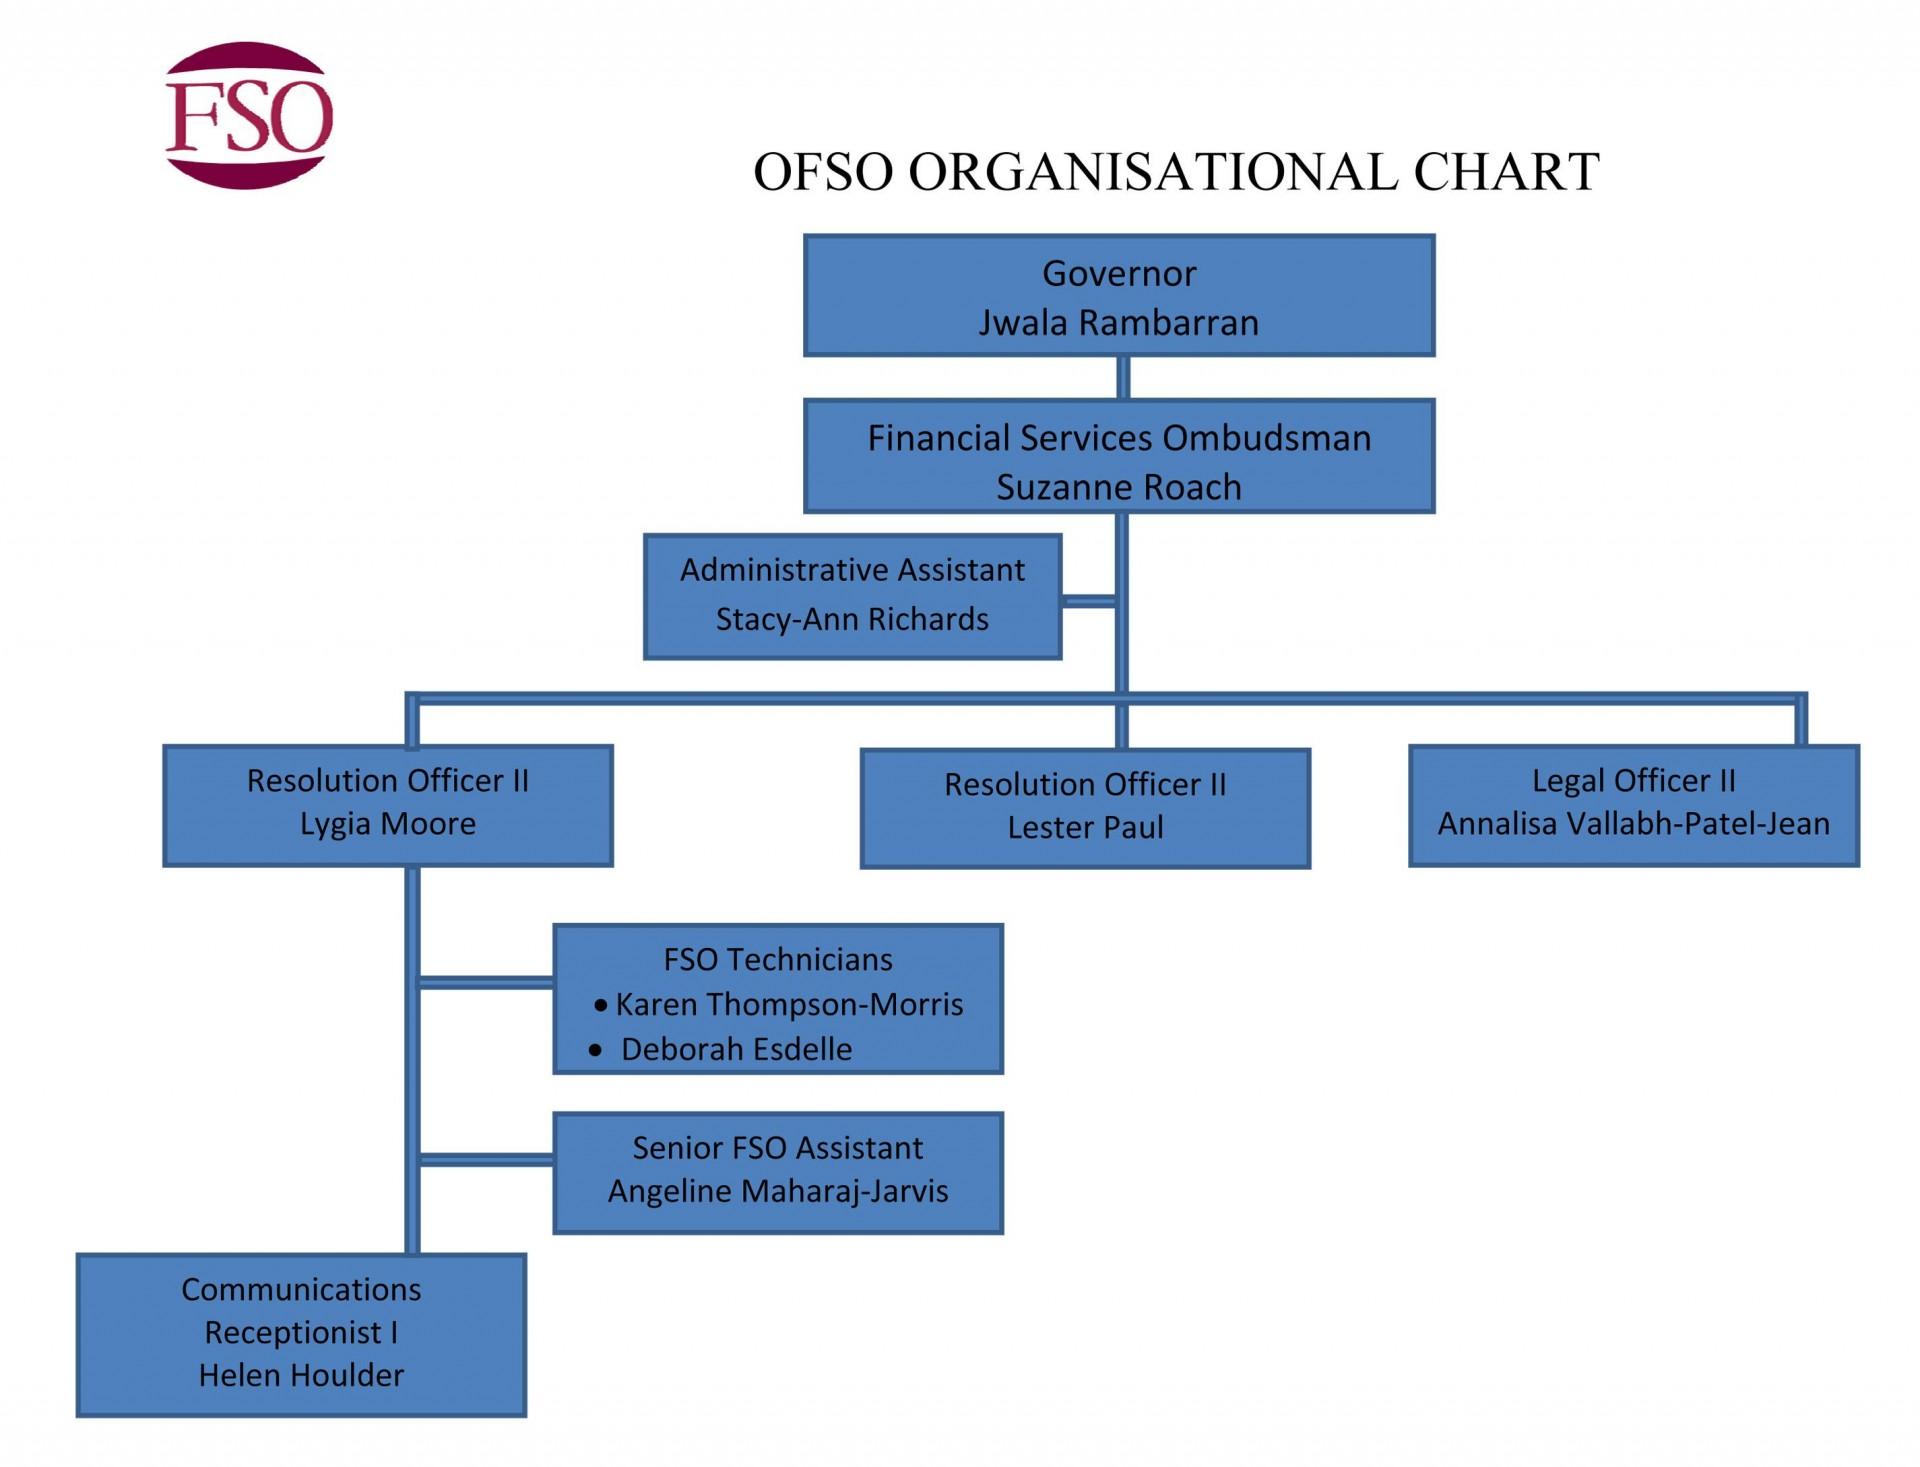 003 Unusual Organization Chart Template Word 2013 Idea  Organizational Free In Microsoft1920